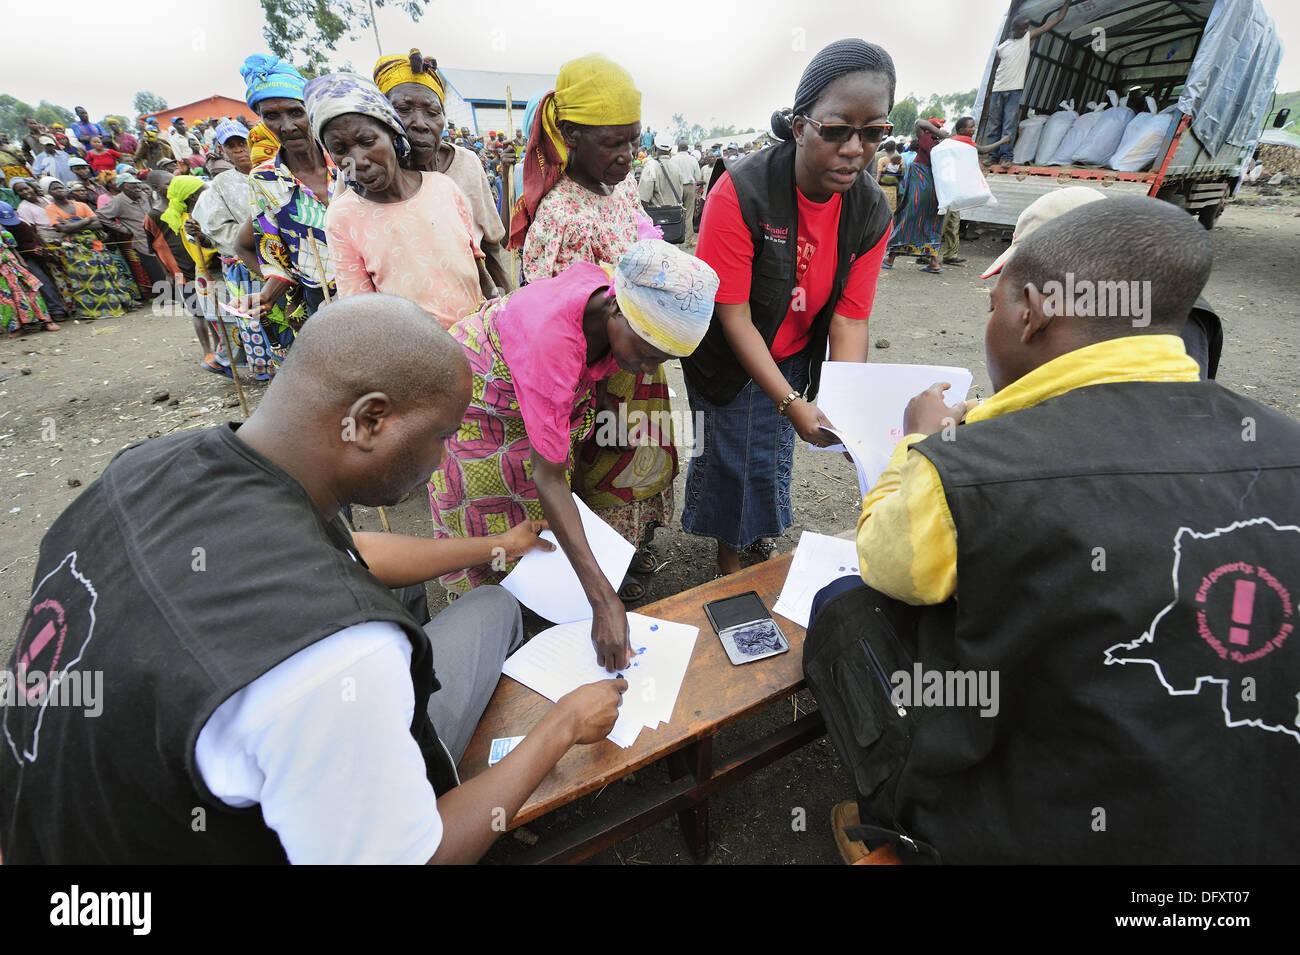 Displaced population registering for food aid dsitribution at the refugee camp Mugunga1, west of Goma, North Kivu, Democratic - Stock Image